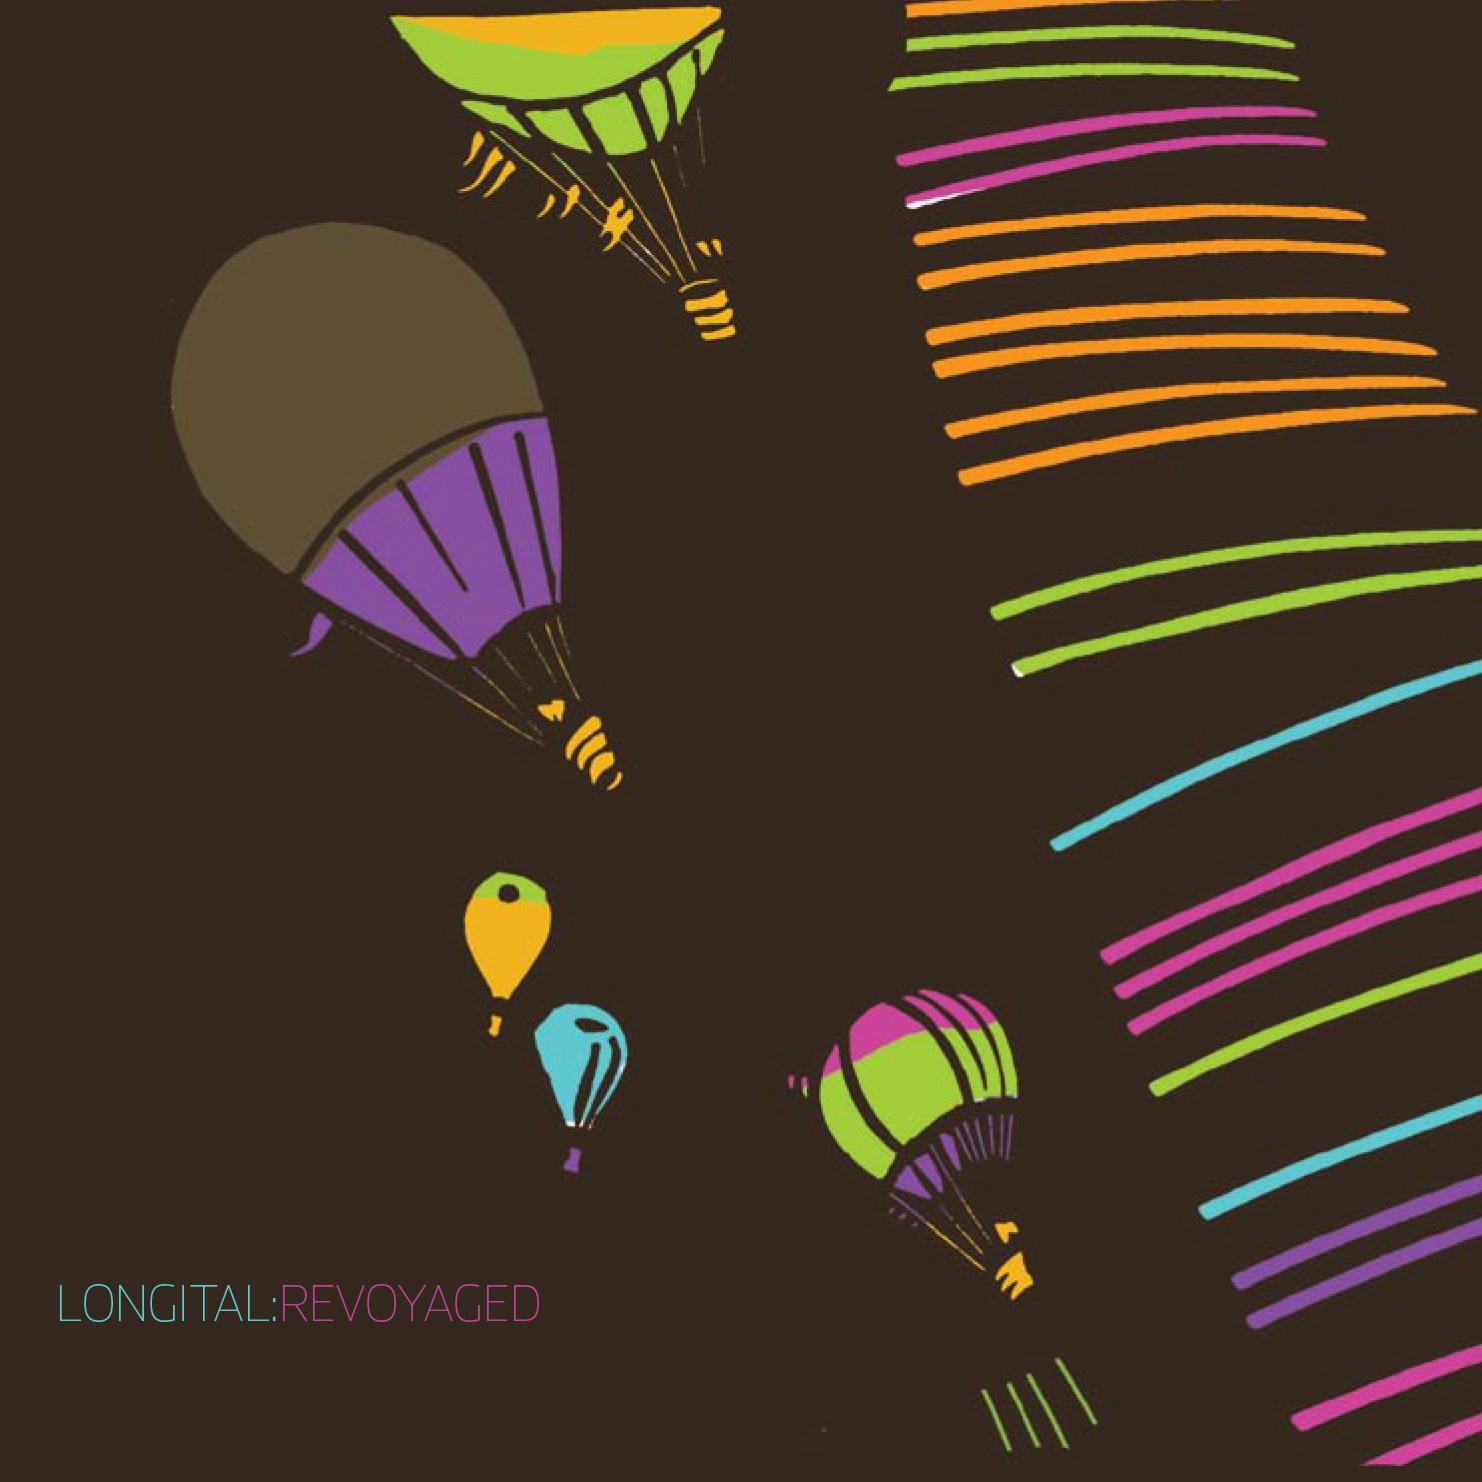 Longital - CD Revoyaged